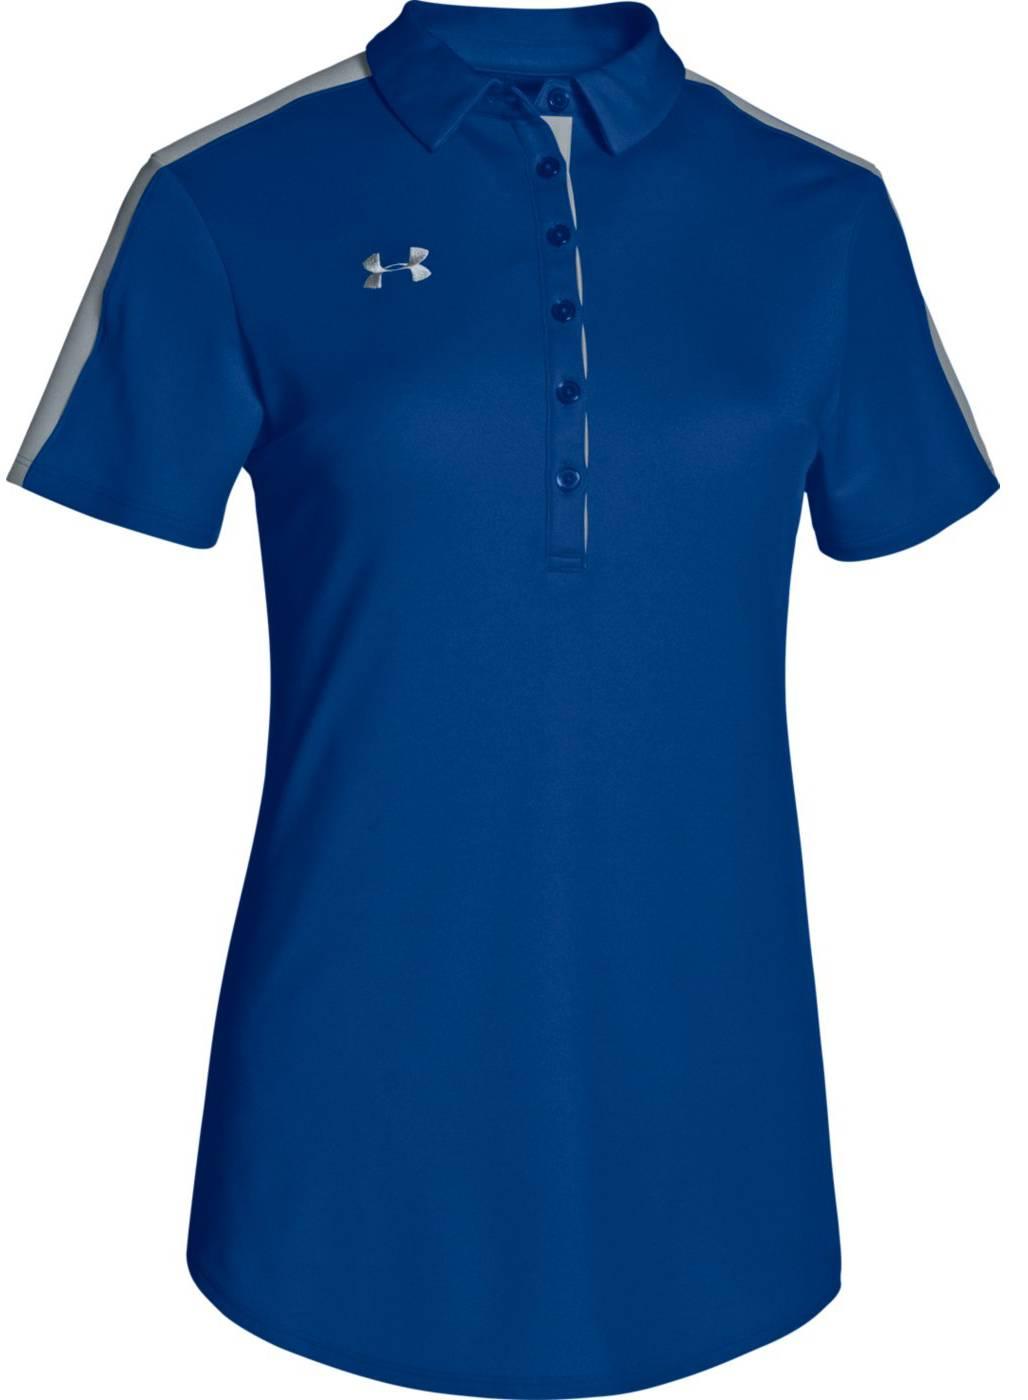 Under Armour Women 39 S Team Colorblock Polo Shirt